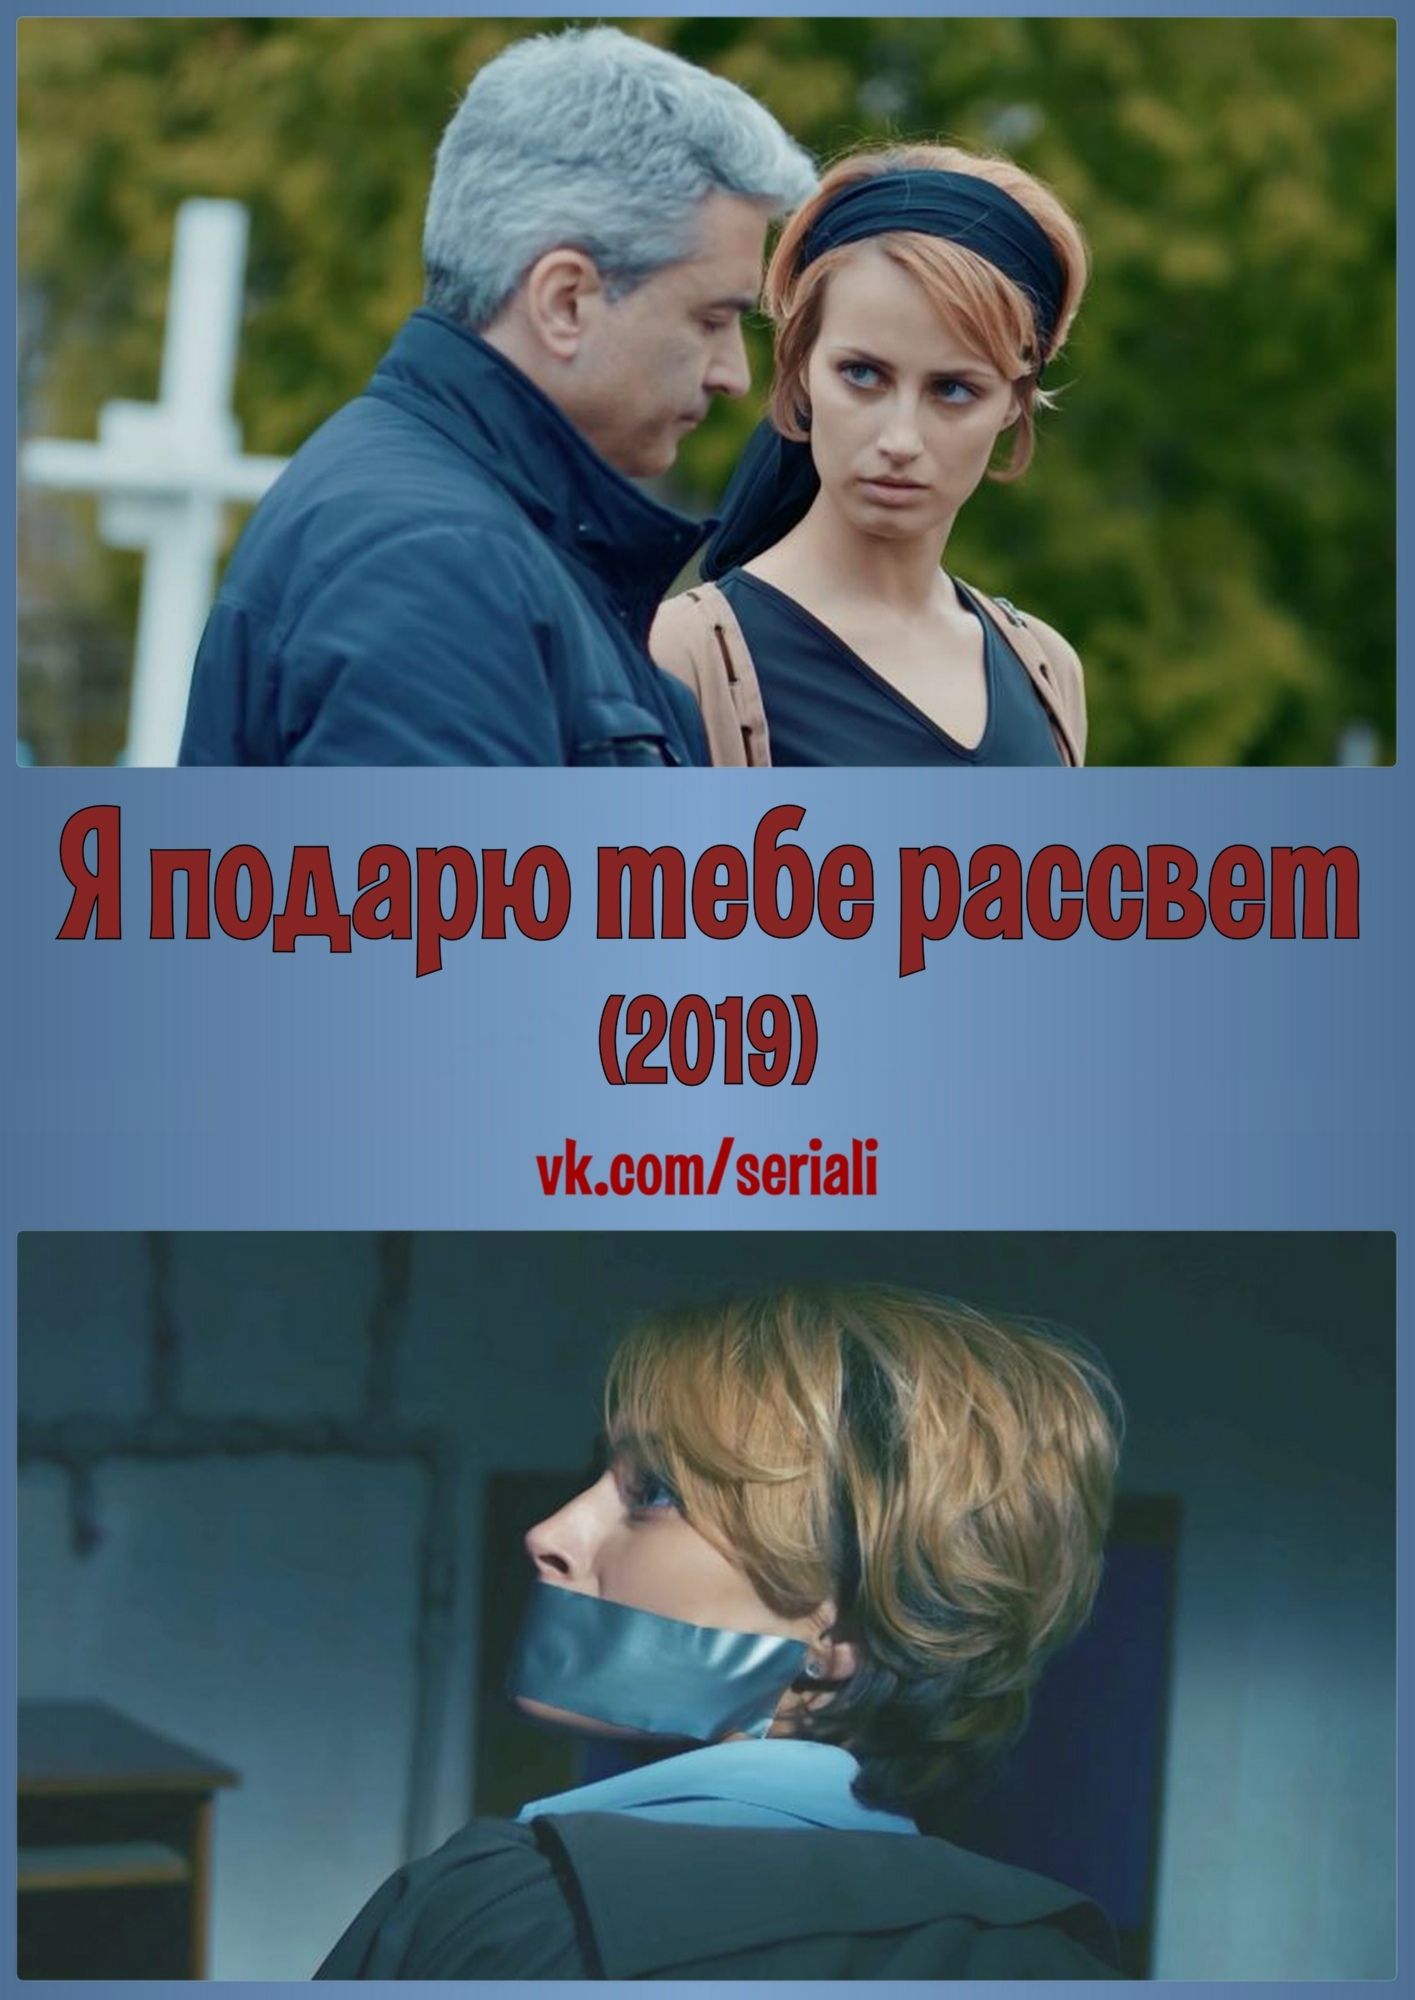 Мелодрама «Я пoдapю тeбe paccвeт» (2018) 1-4 серия из 4 HD